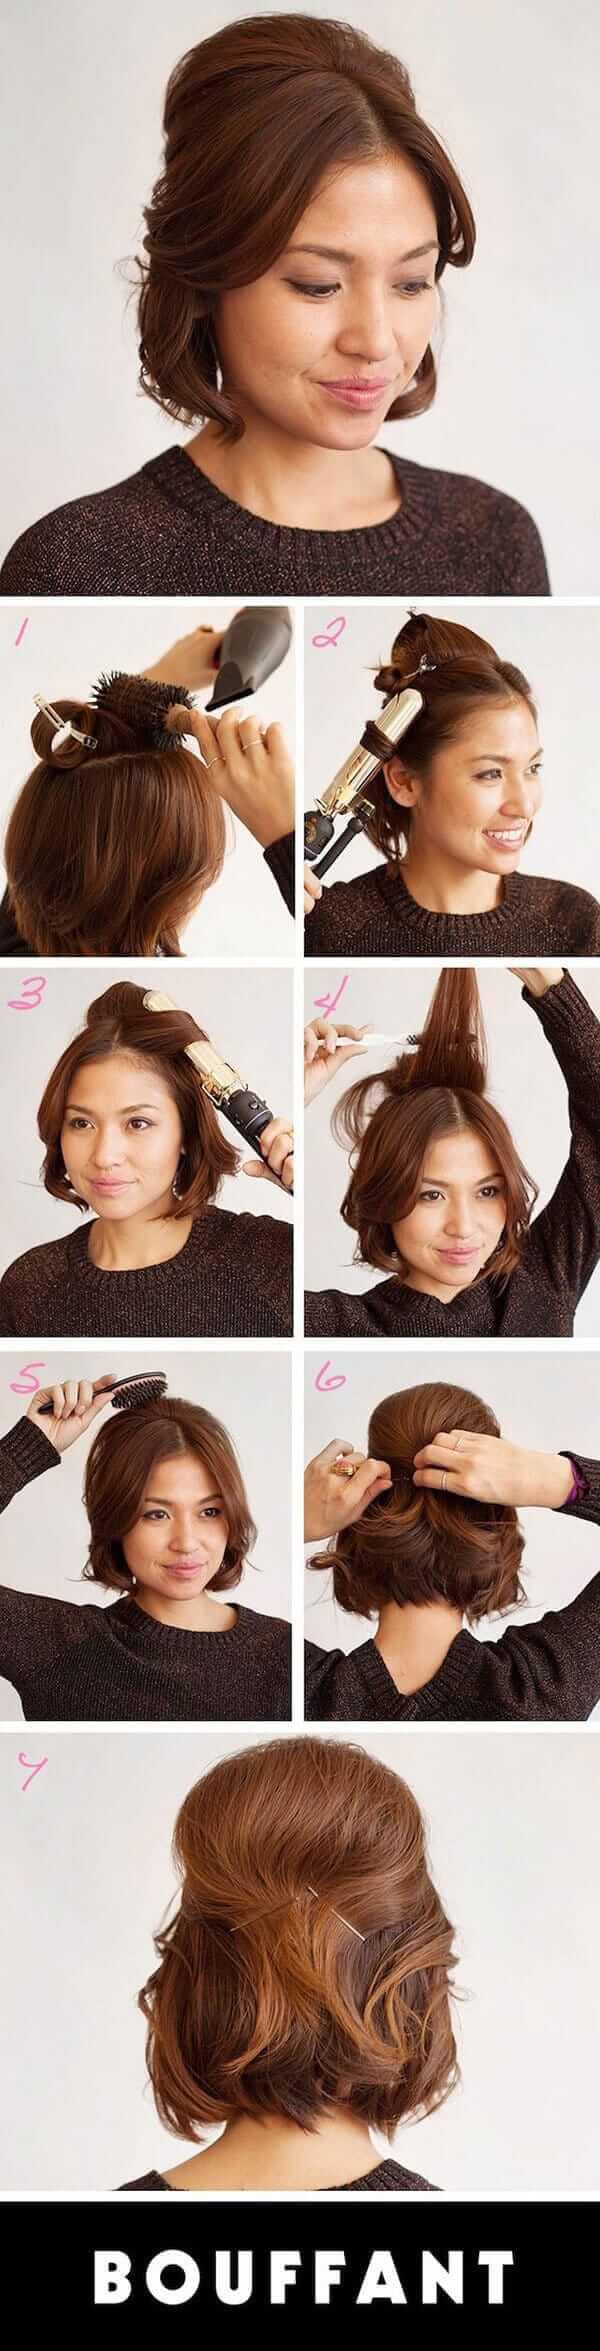 einfache Kurzhaarfrisur - Haartrend-Ideen